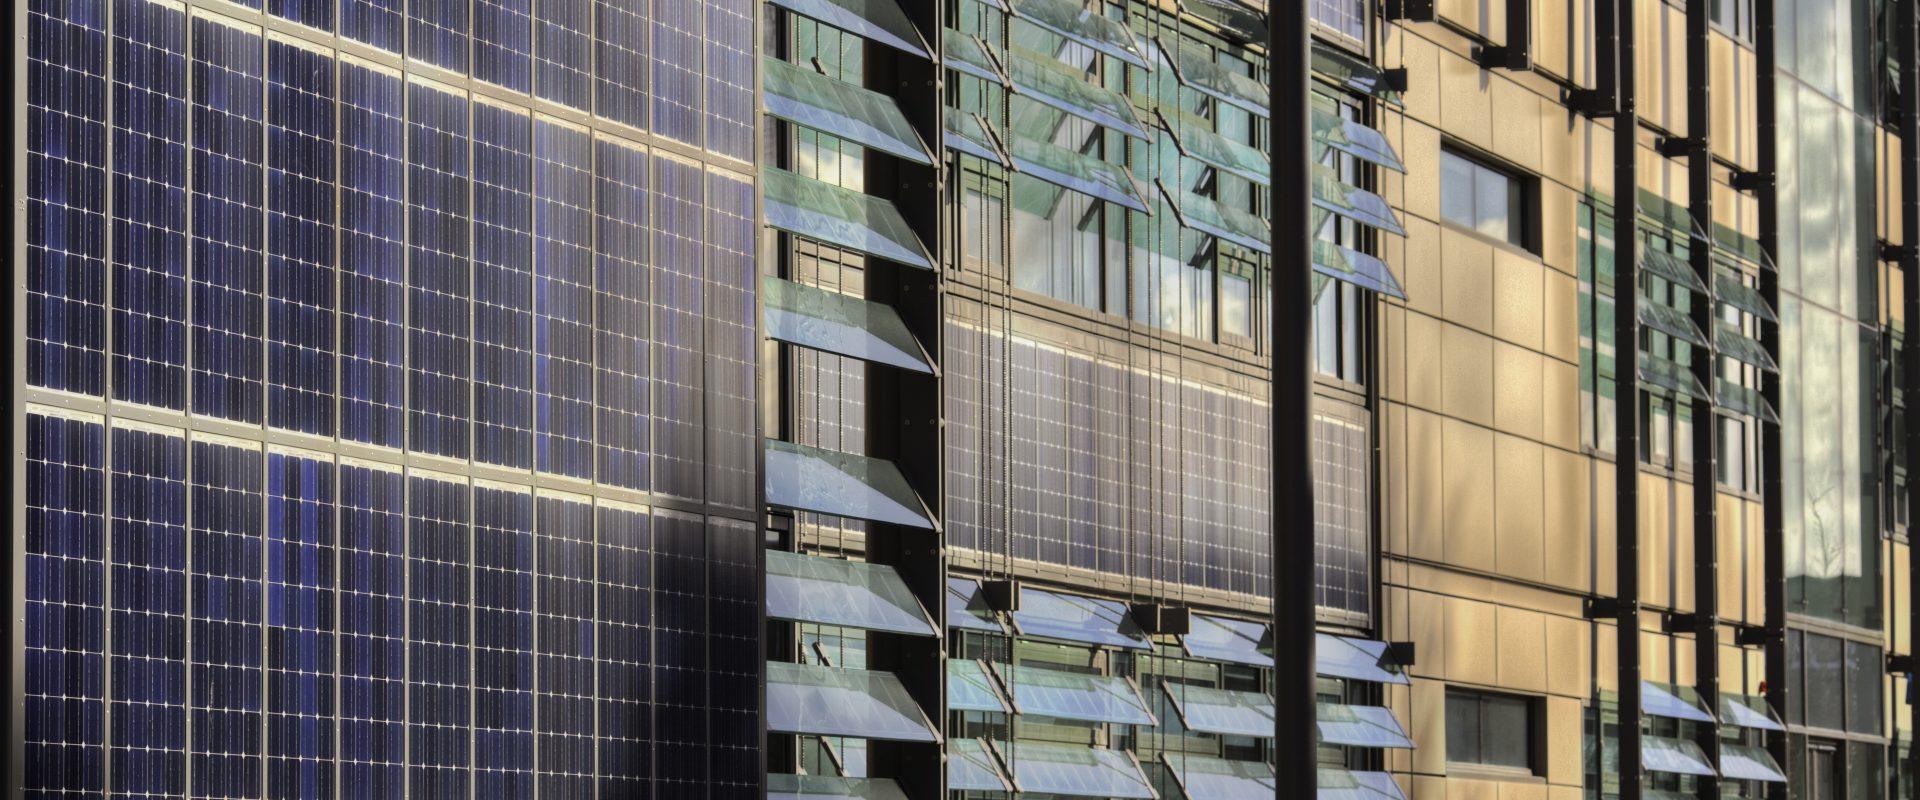 Facade of solar panelled building